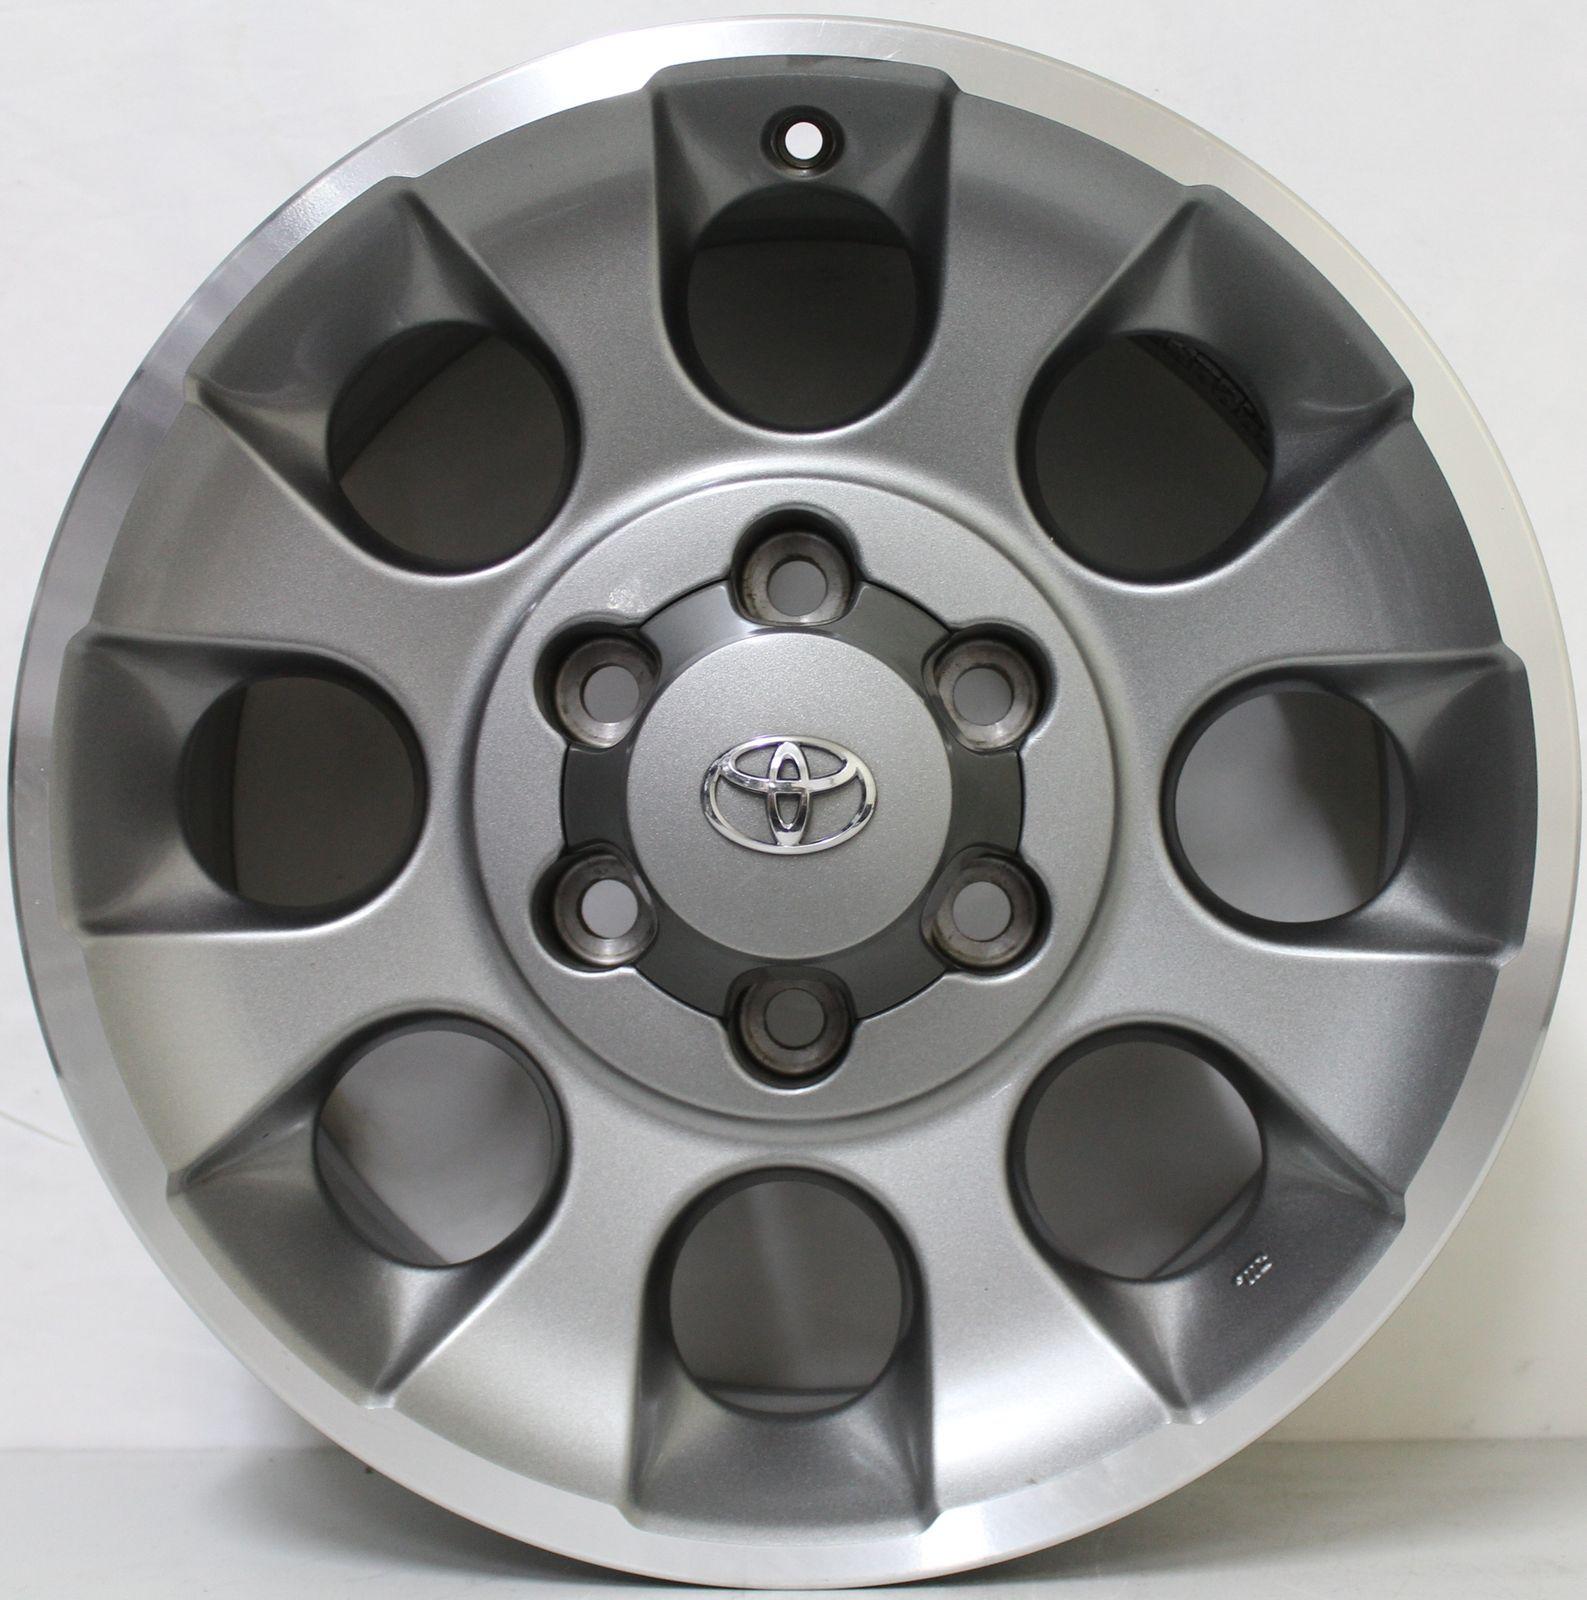 17 Inch Genuine Toyota FJ Cruiser 2013 Model Alloy Wheels   eBay